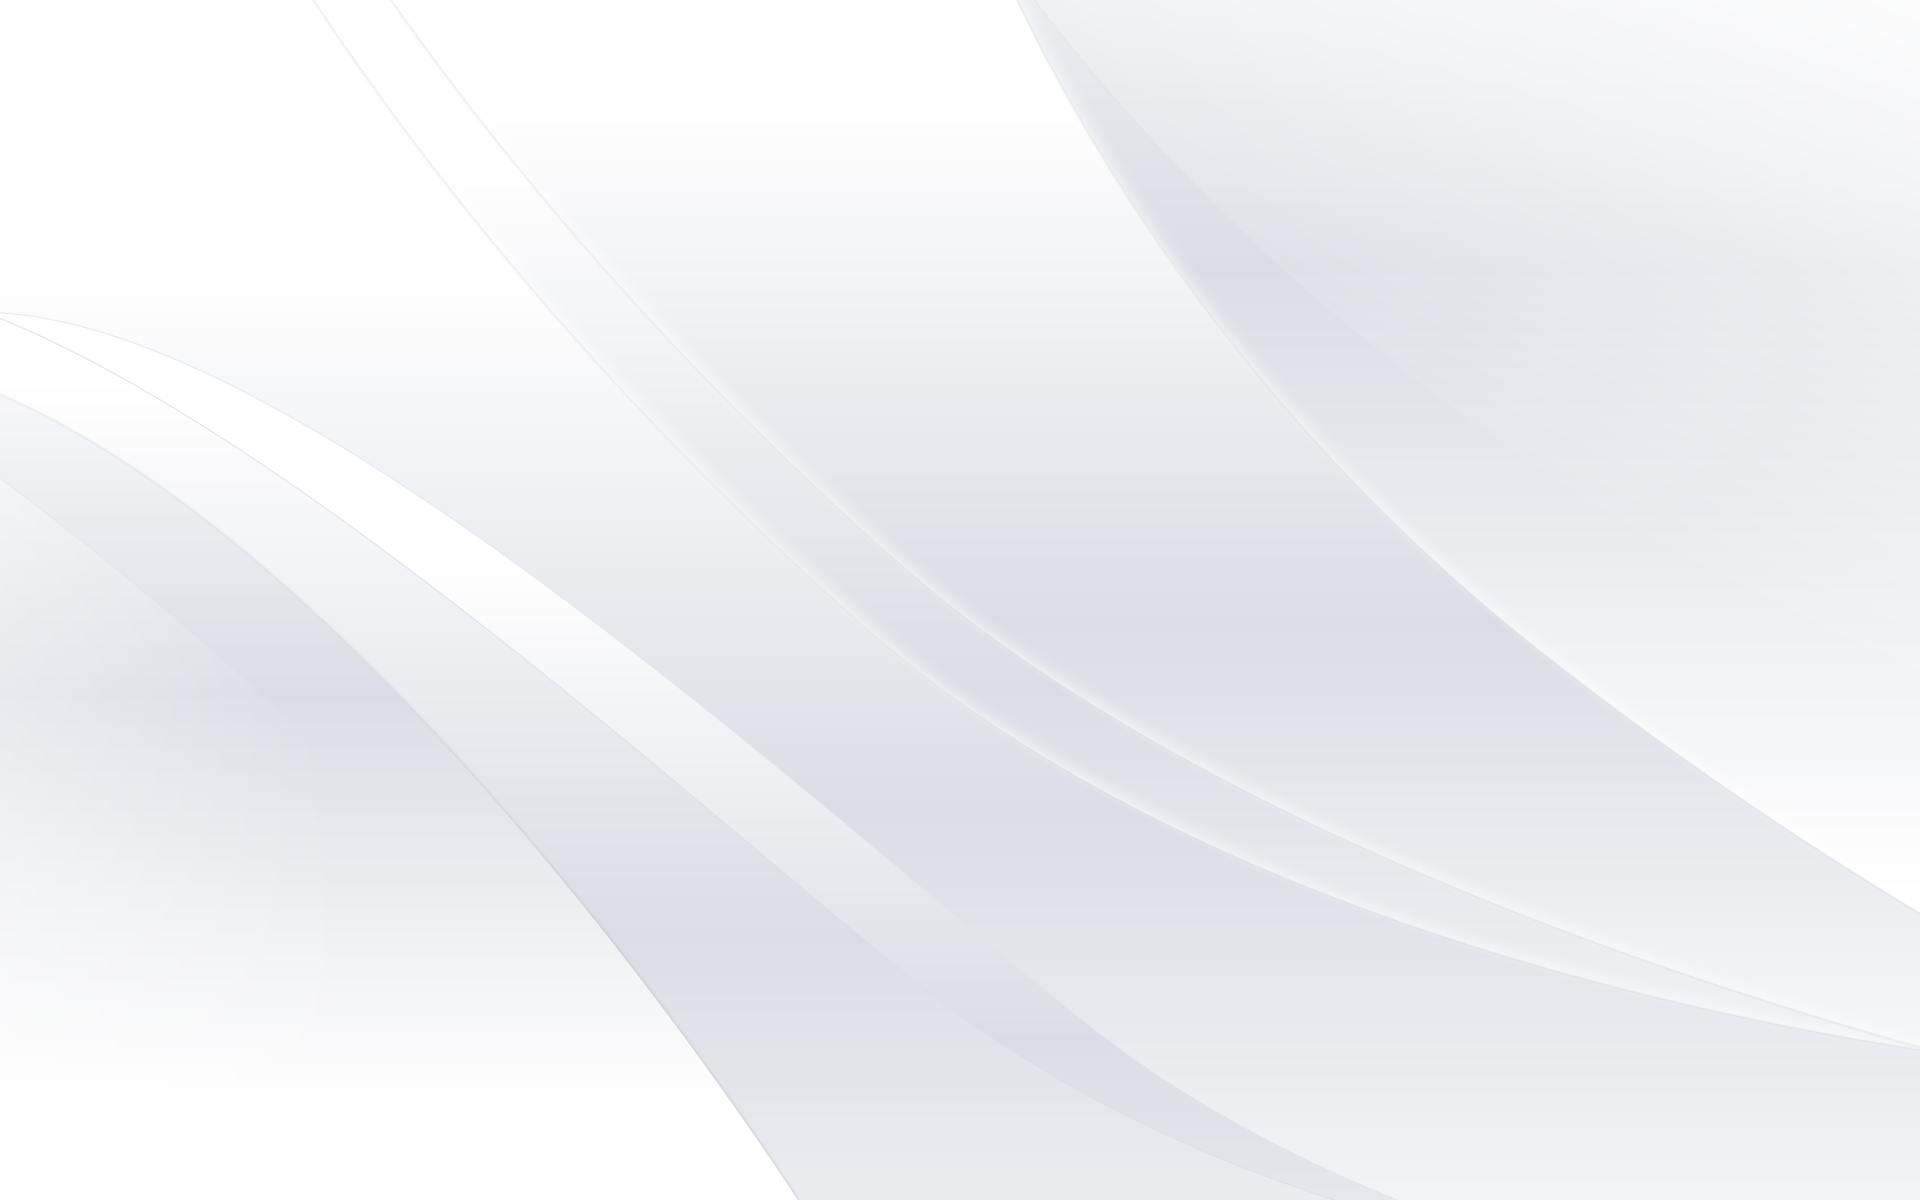 White Desktop Backgrounds 1920x1200